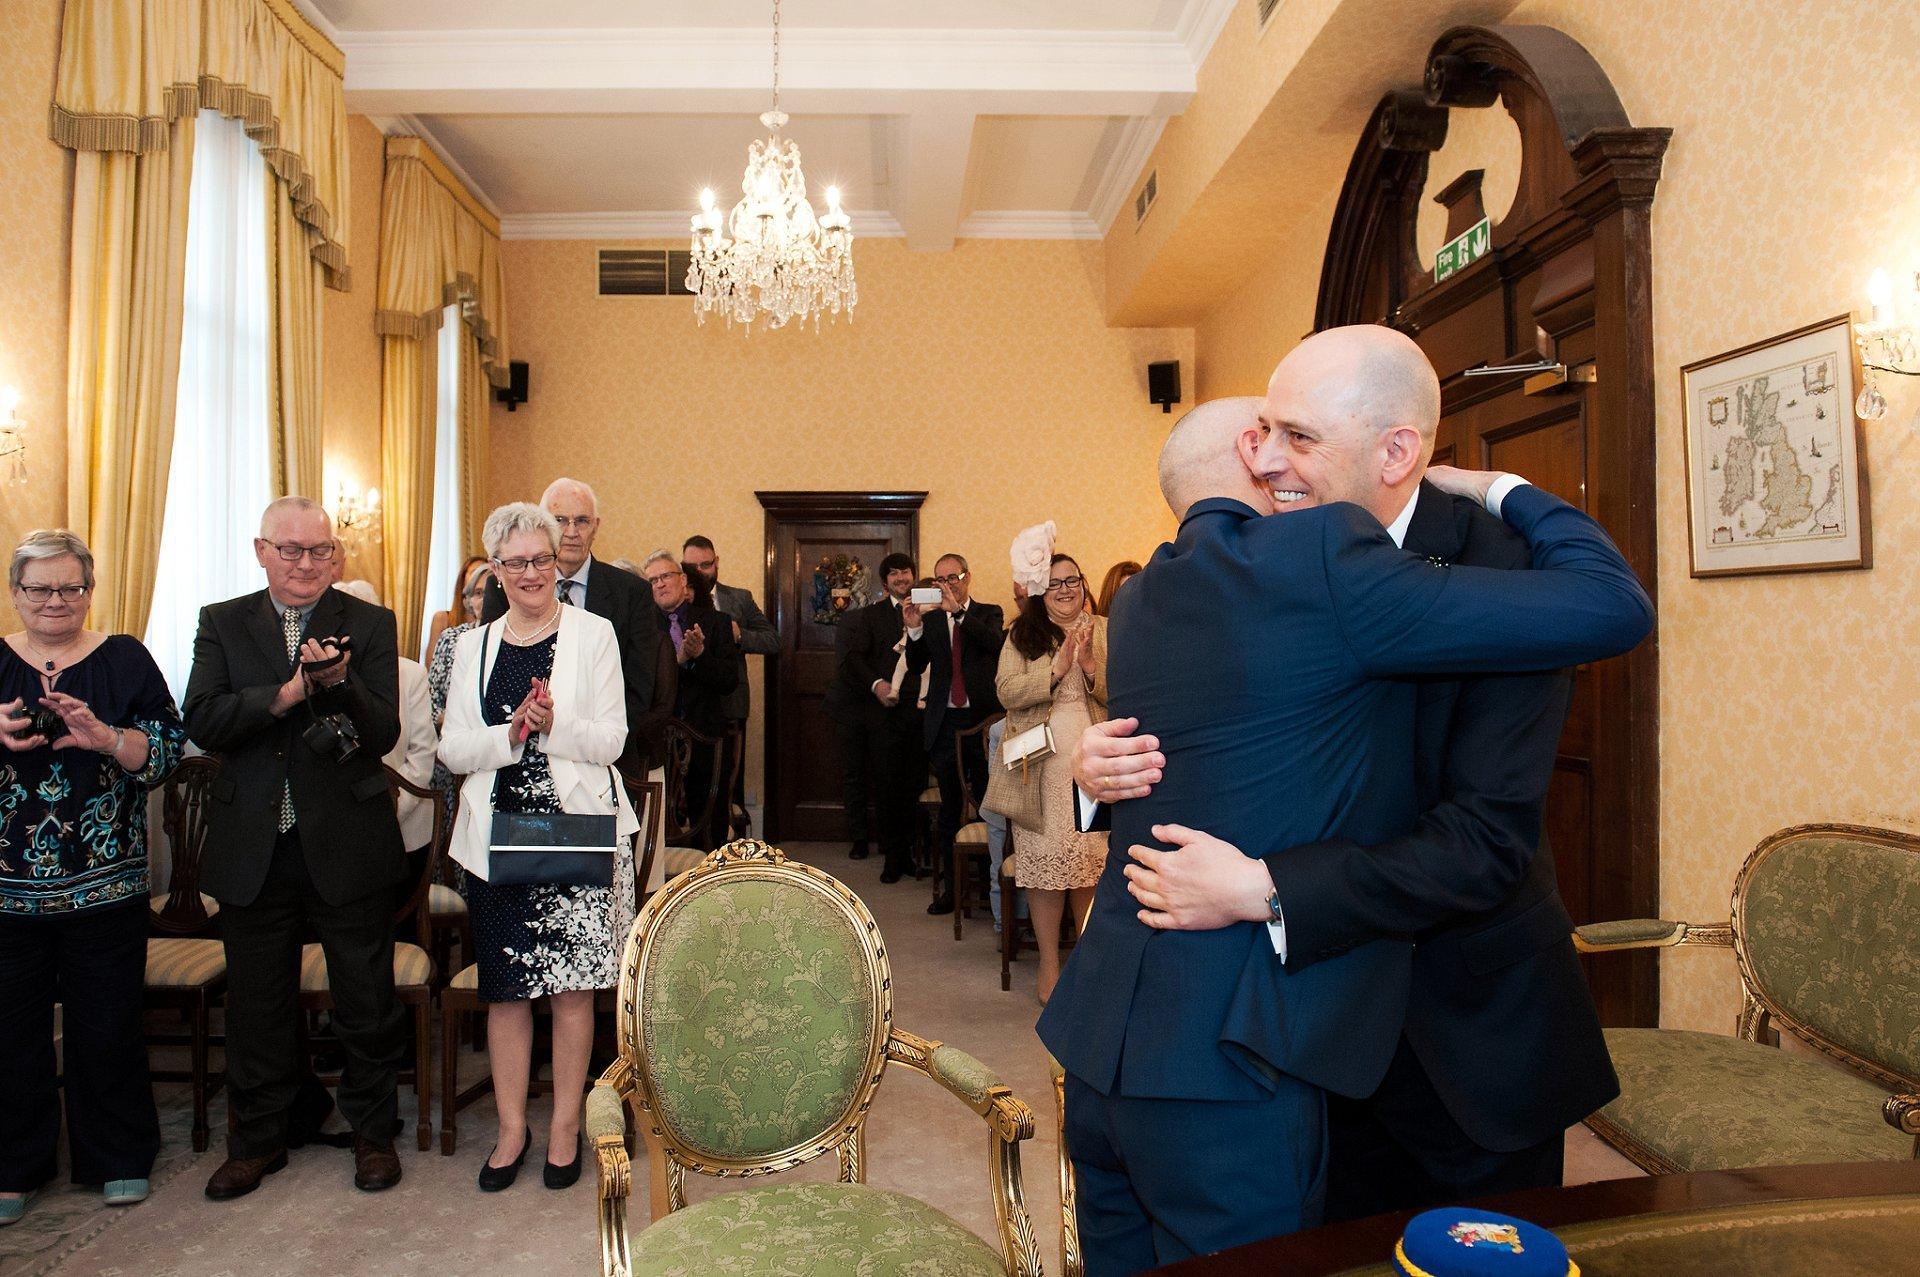 Hugging grooms in Chelsea's Old Town Hall